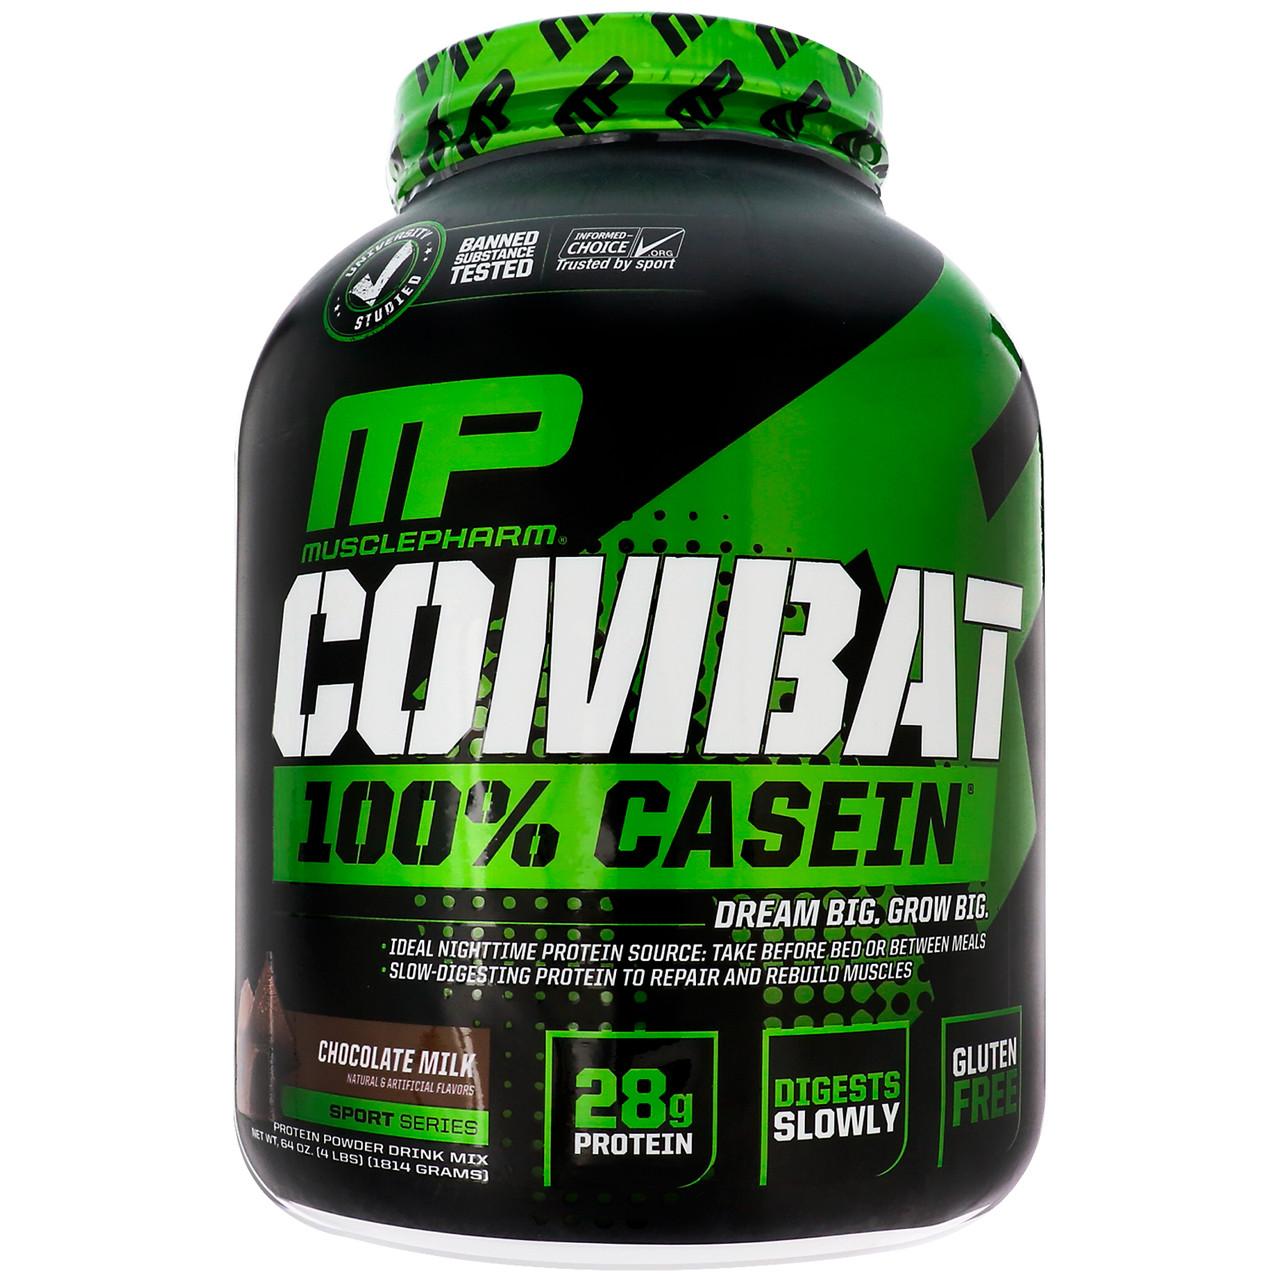 Мицеллярный казеин, (Combat, 100% Micellar Casein Protein), шоколад, Muscle Pharm, 1814 кг